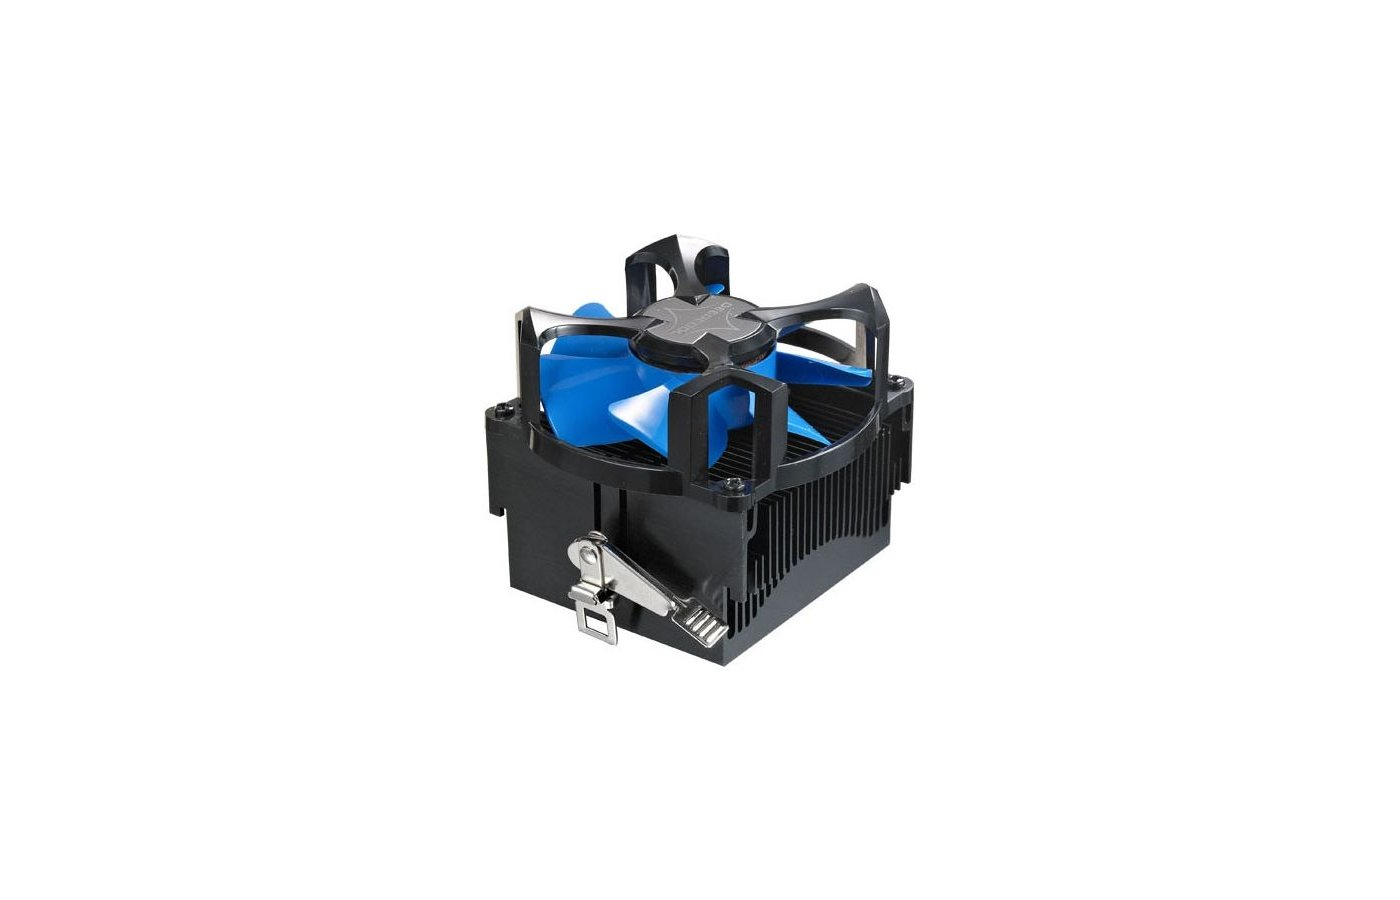 Охлаждение Deepcool BETA 11 Soc-FM2/FM1/AM3+/AM3/AM2+/AM2 3pin 31dB Al 95W 381g скоба